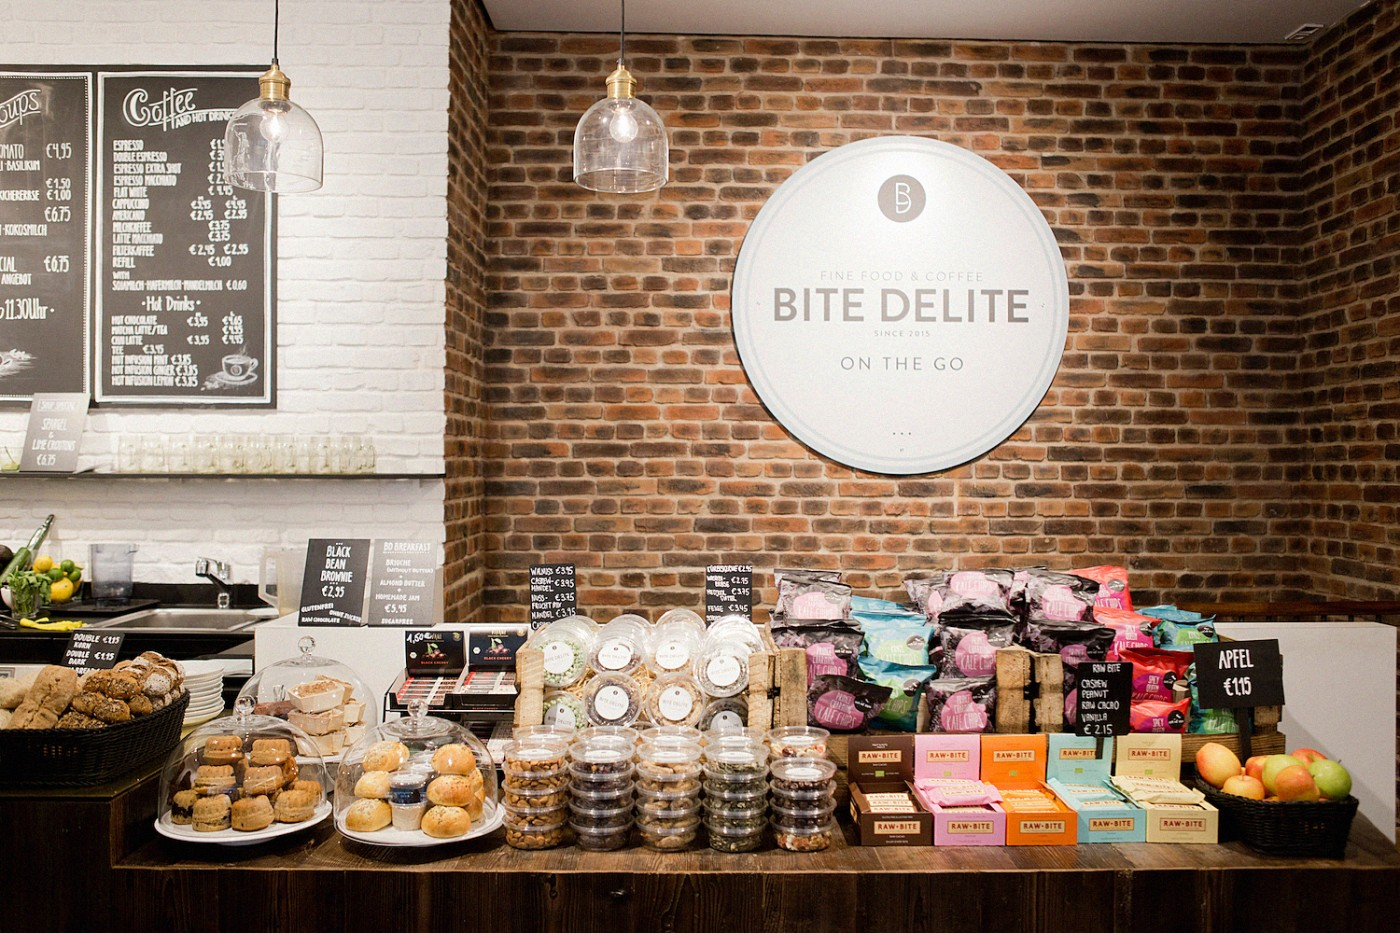 english restaurants in munich breakfast at bite delite. Black Bedroom Furniture Sets. Home Design Ideas